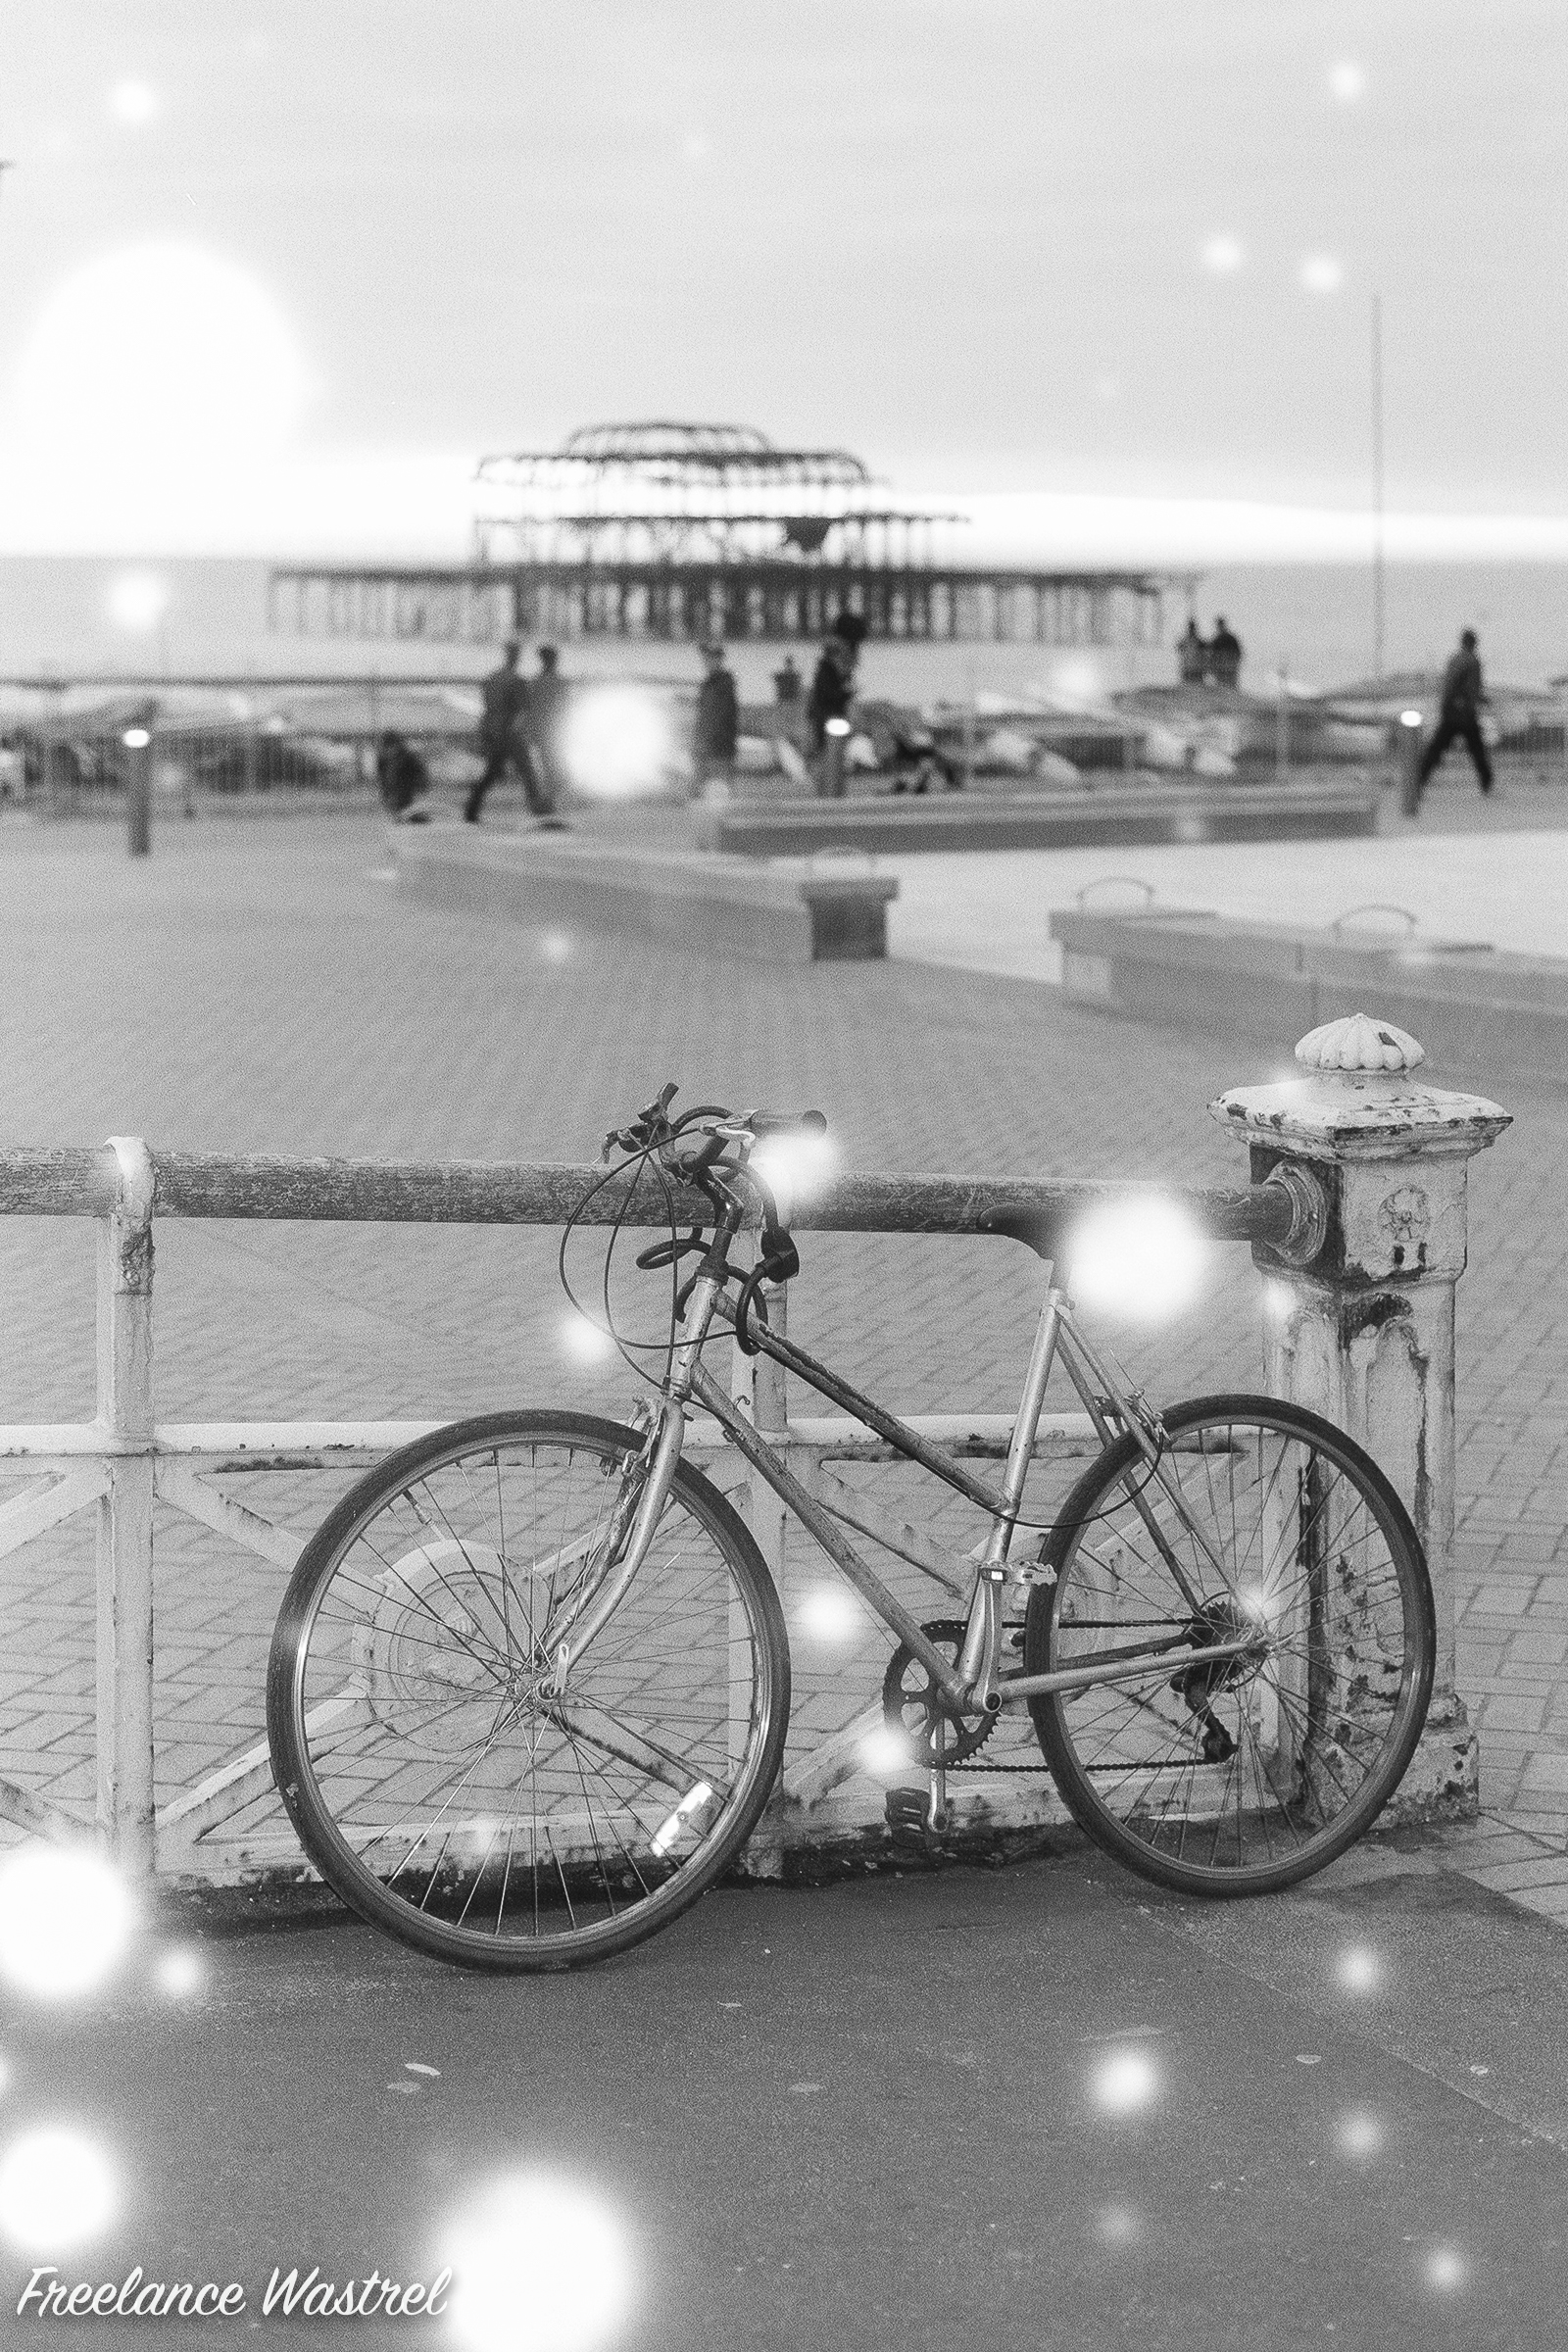 Brighton bicycle, December 2018